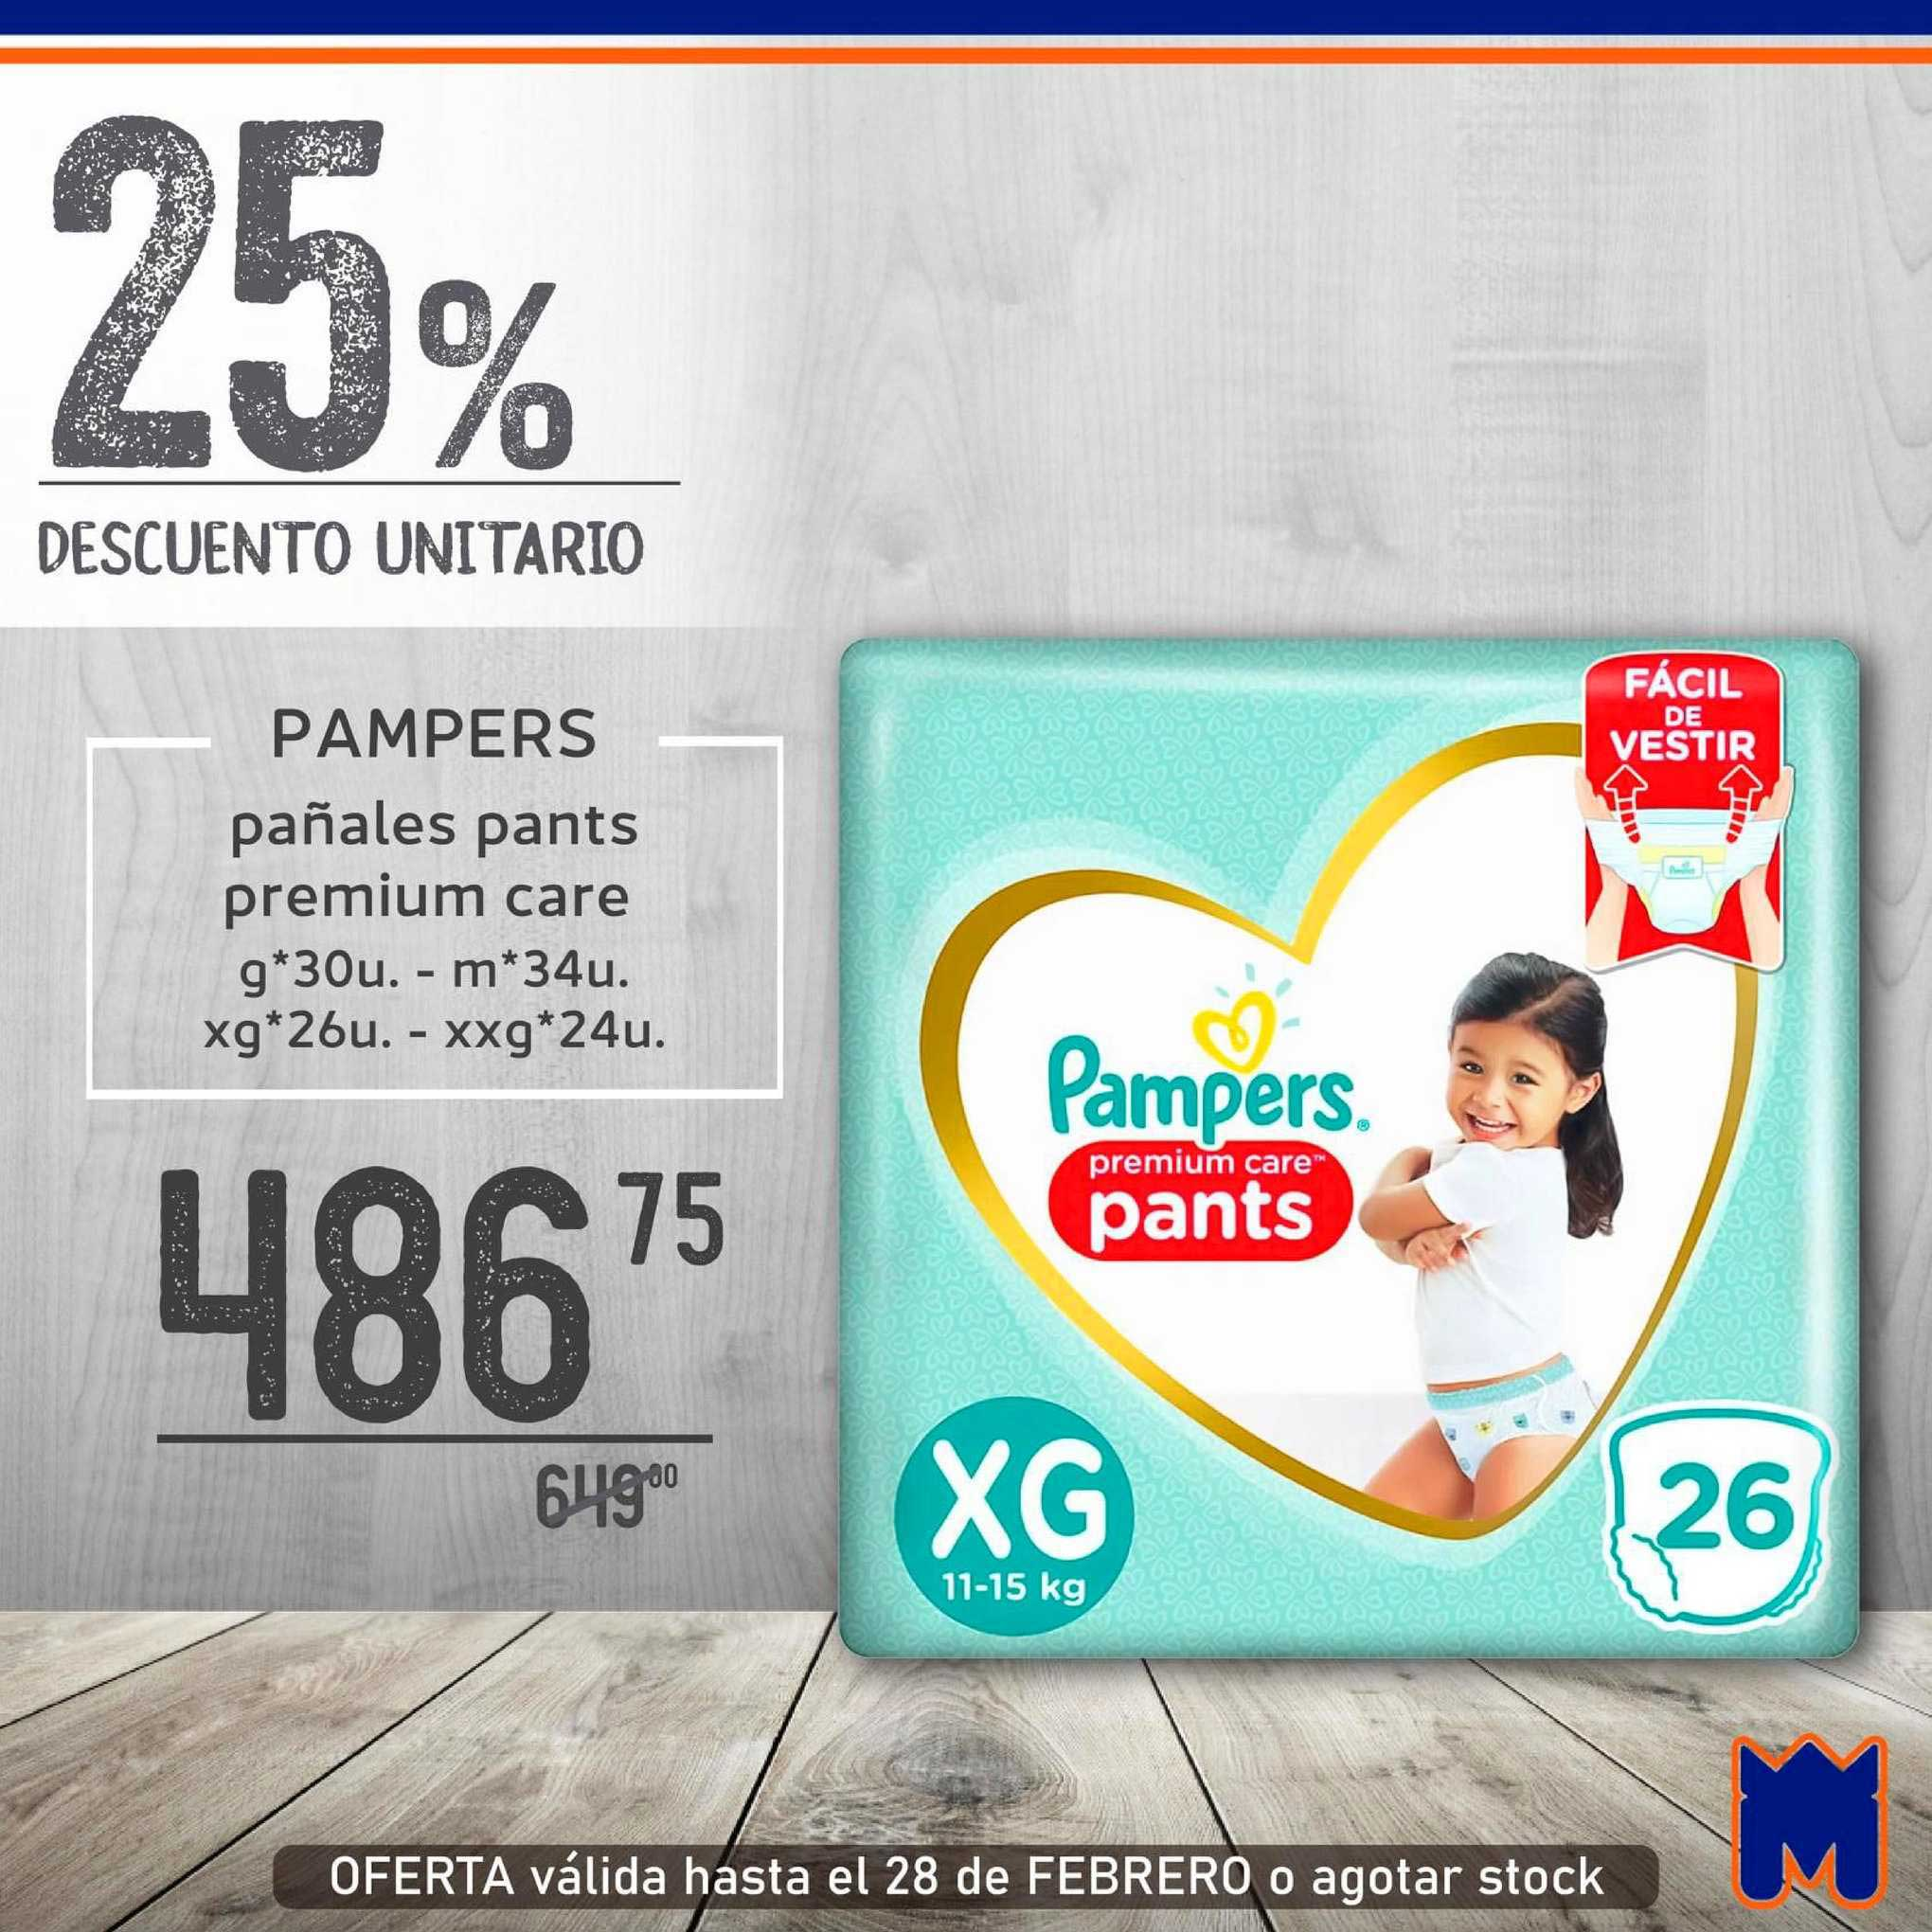 Supermercados Monarca Pampers Pañales Pants Premium Care